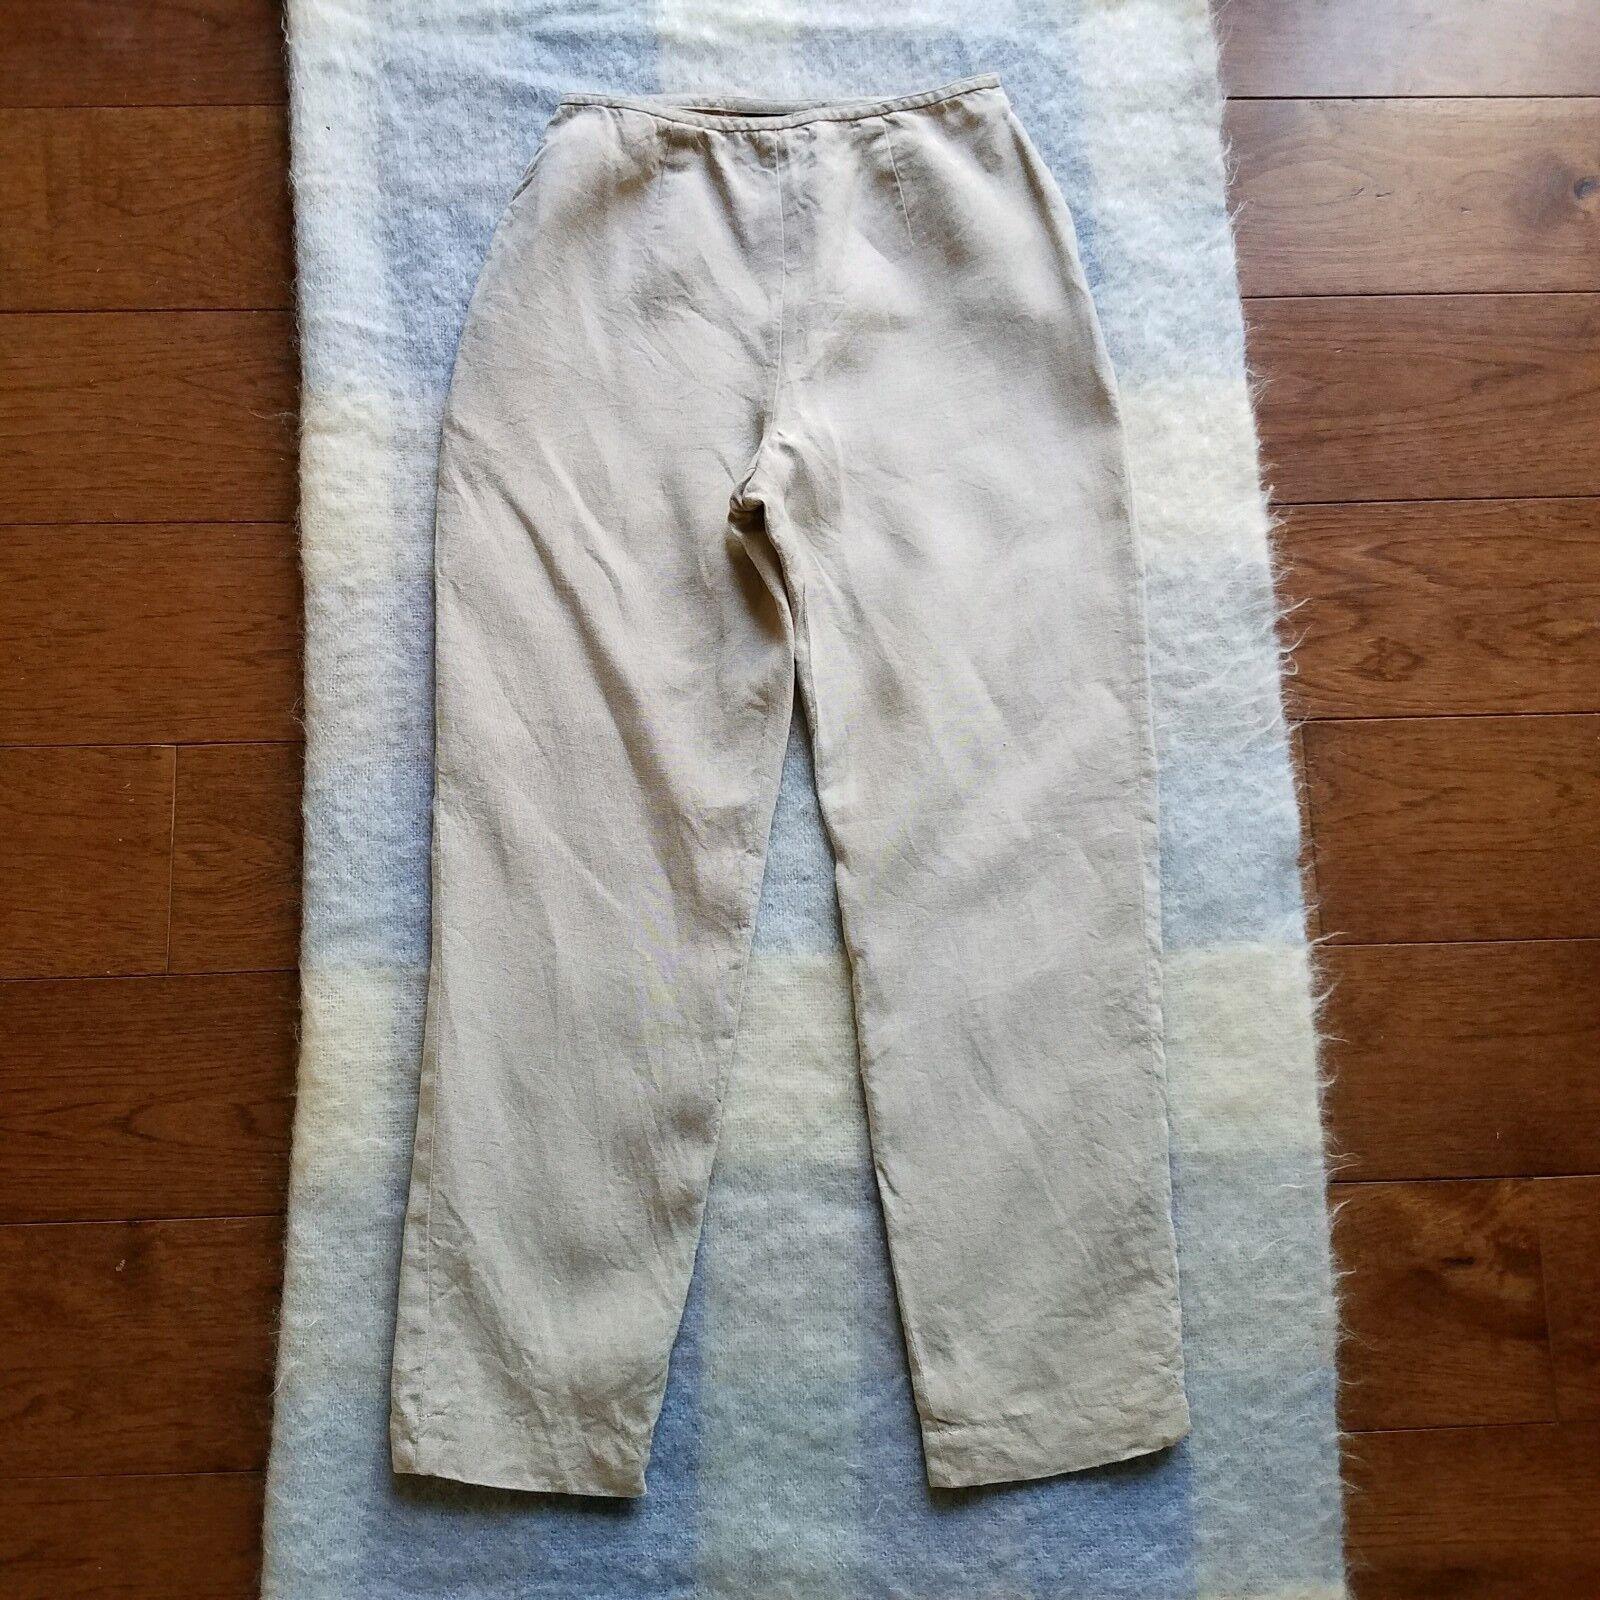 Sigrid Olsen Lined 100% Linen Pants Size 4 Oatmeal Beige Tapered Leg High Waist